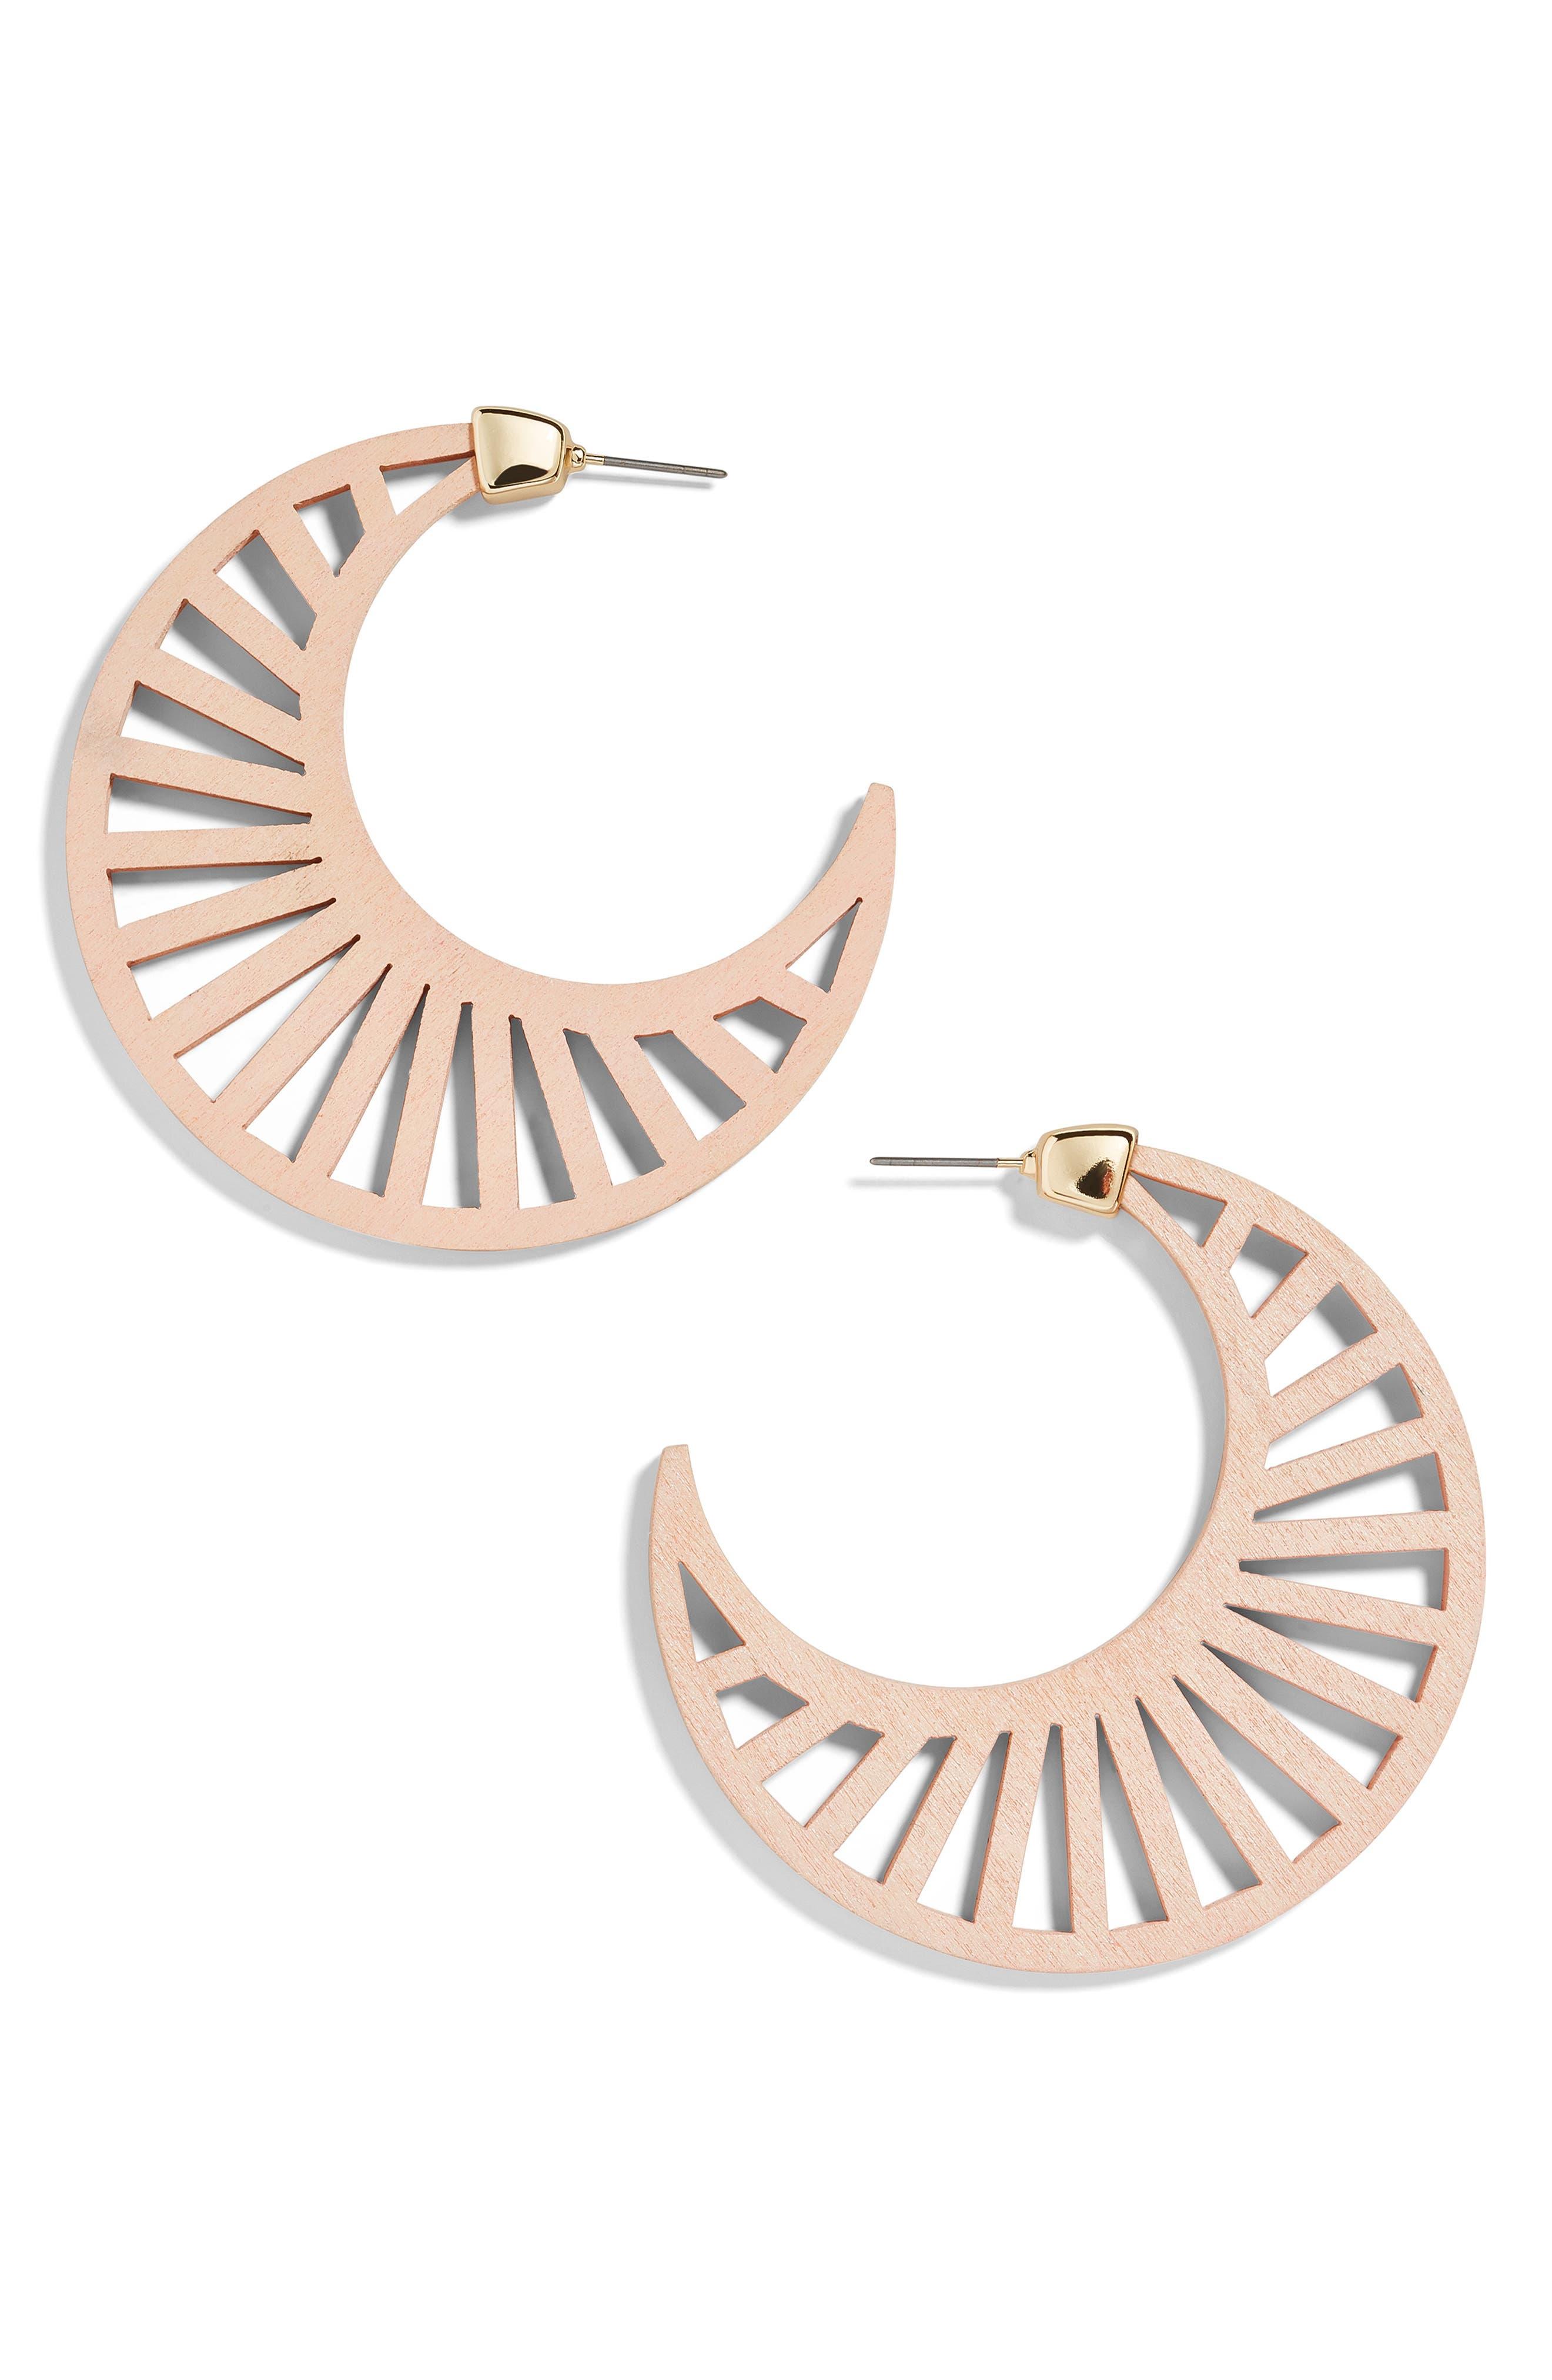 BAUBLEBAR Wooden Crescent Moon Earrings, Main, color, 250